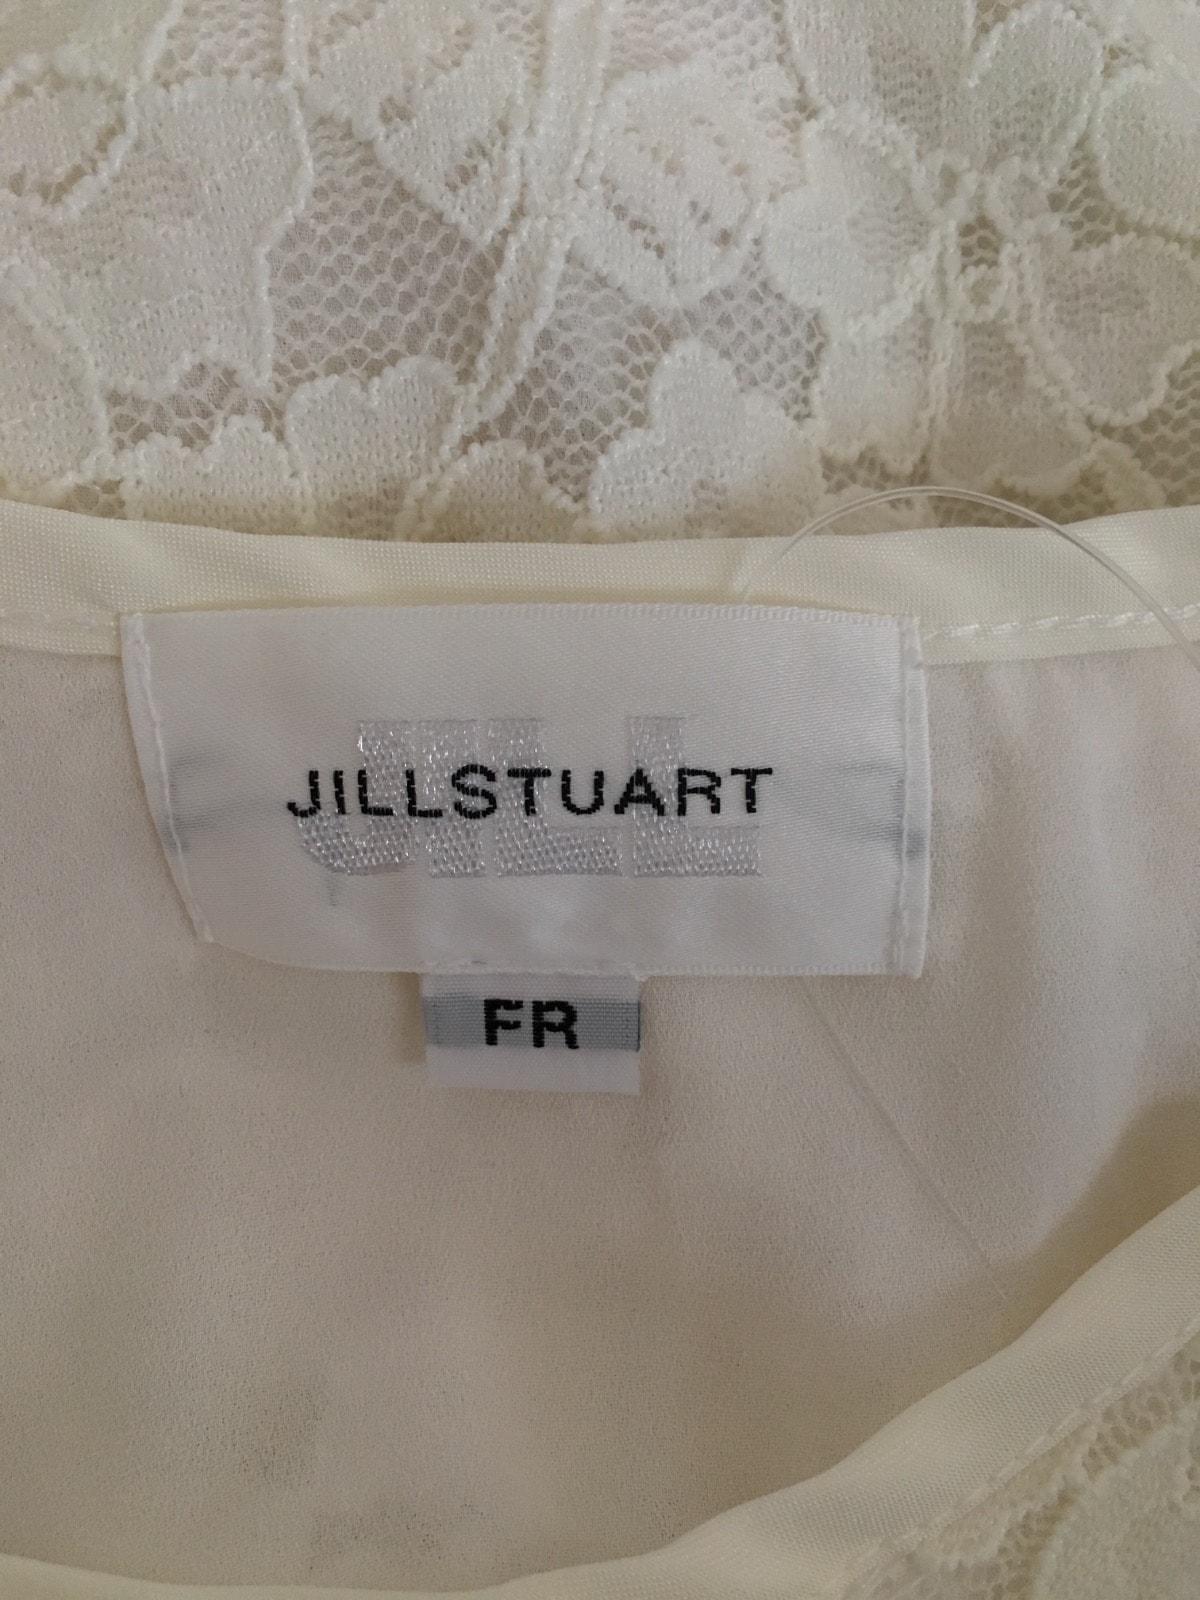 JILL by JILLSTUART(ジルバイジルスチュアート)のタンクトップ